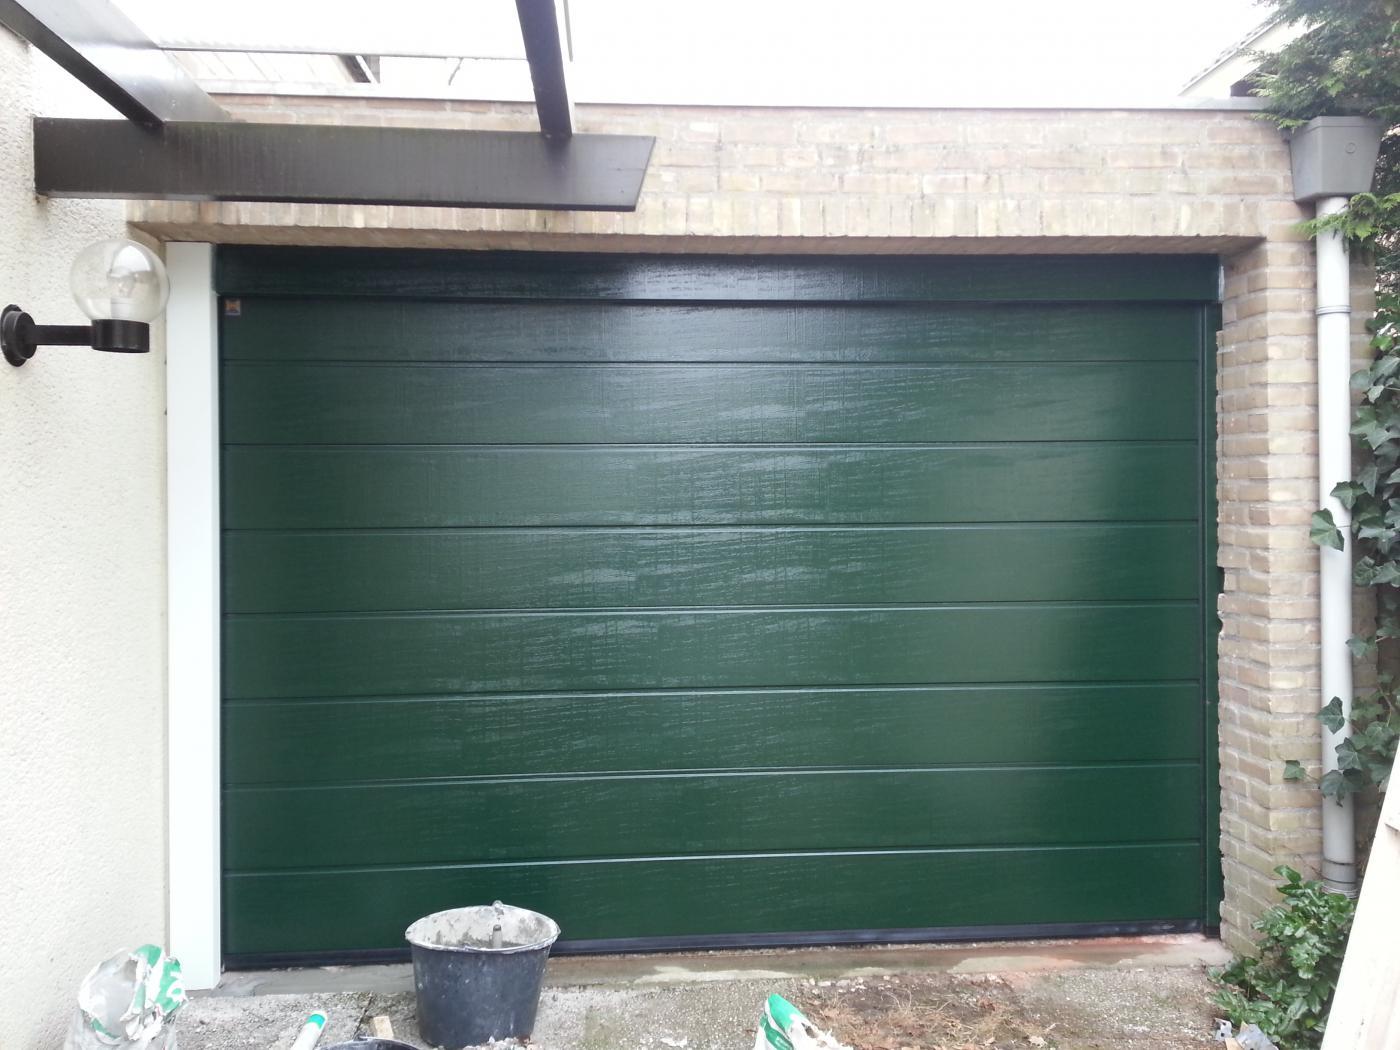 Referenties van h rmann bekijk hoe het eruit kan komen te zien - Deur kast garagedeur ...